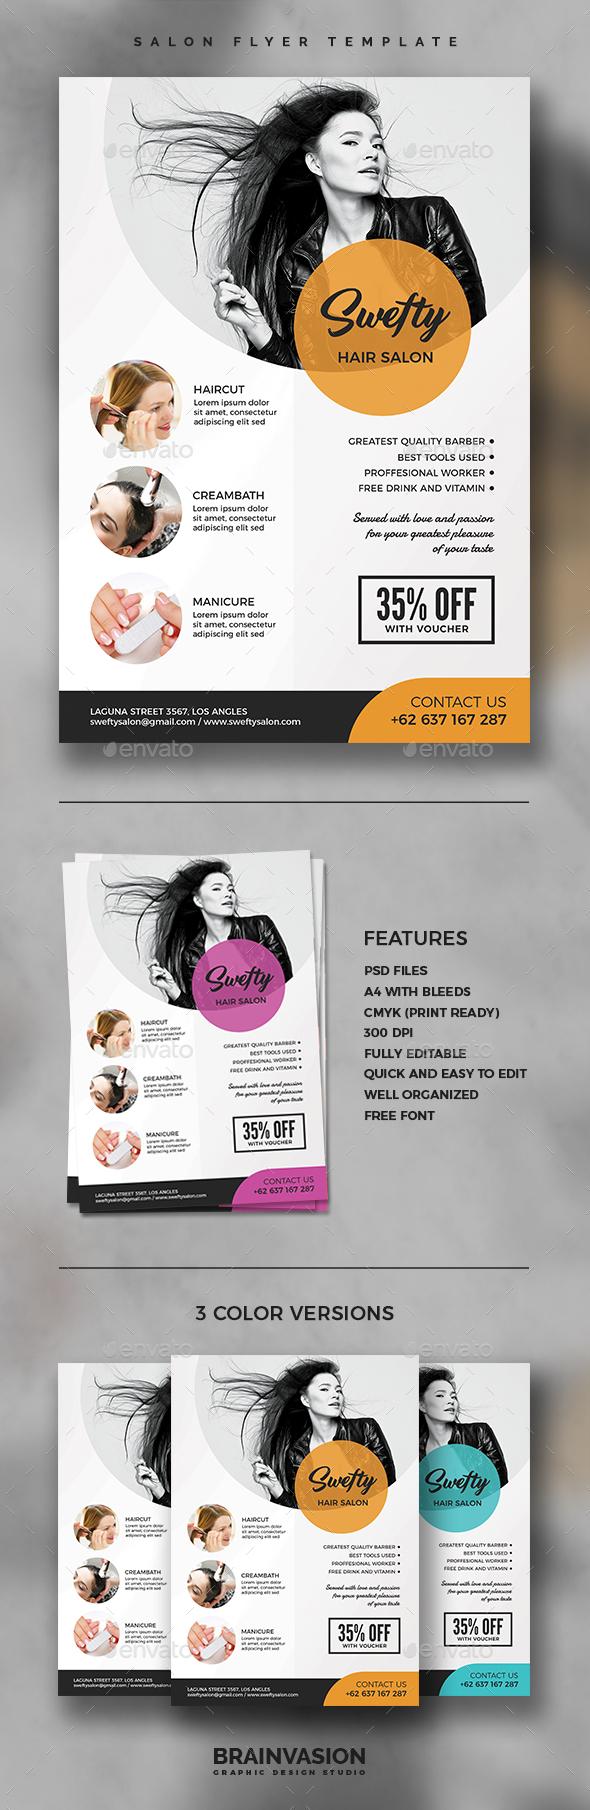 Salon Flyer Template Vol.02 - Corporate Brochures